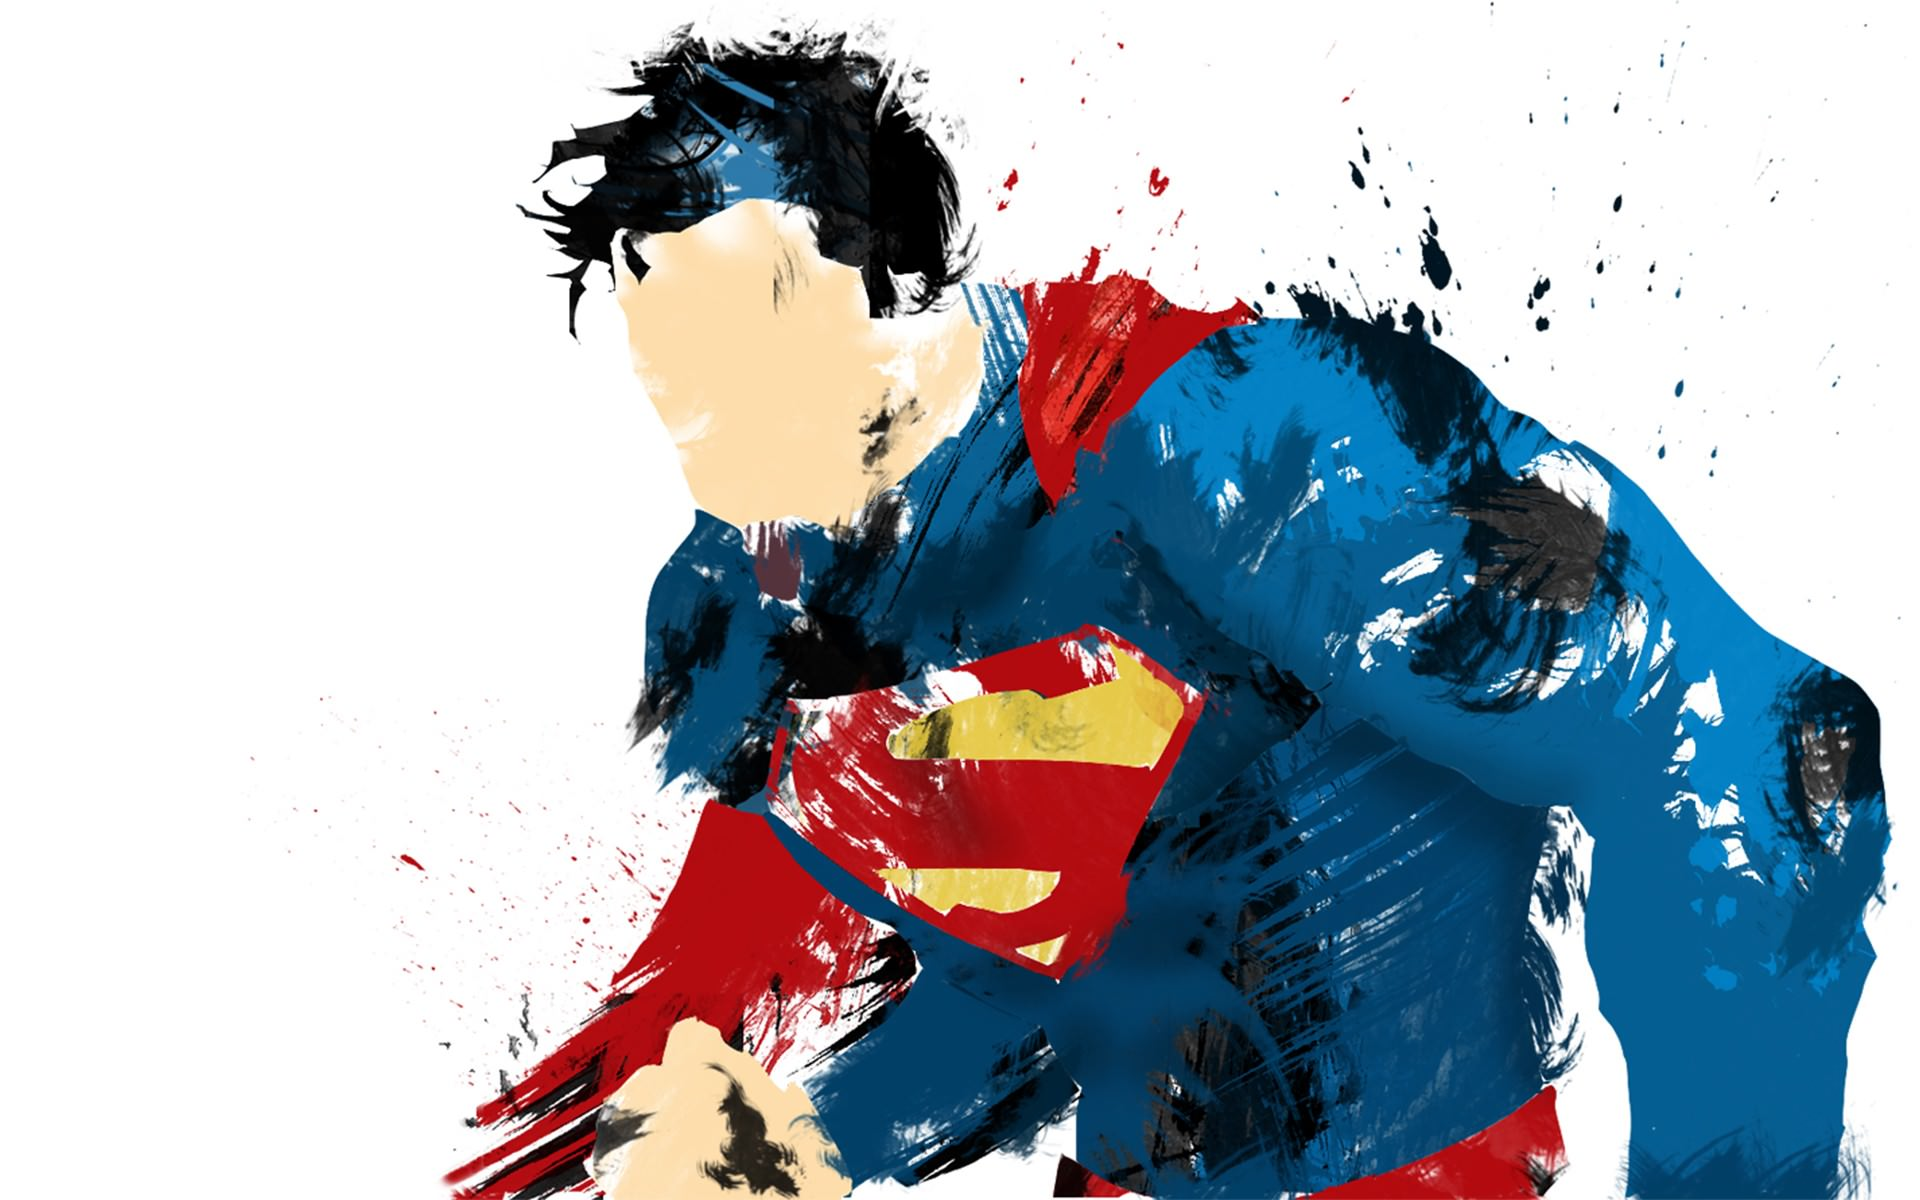 Superman Man of Steel Painted Wallpaper   DigitalArtio 1920x1200